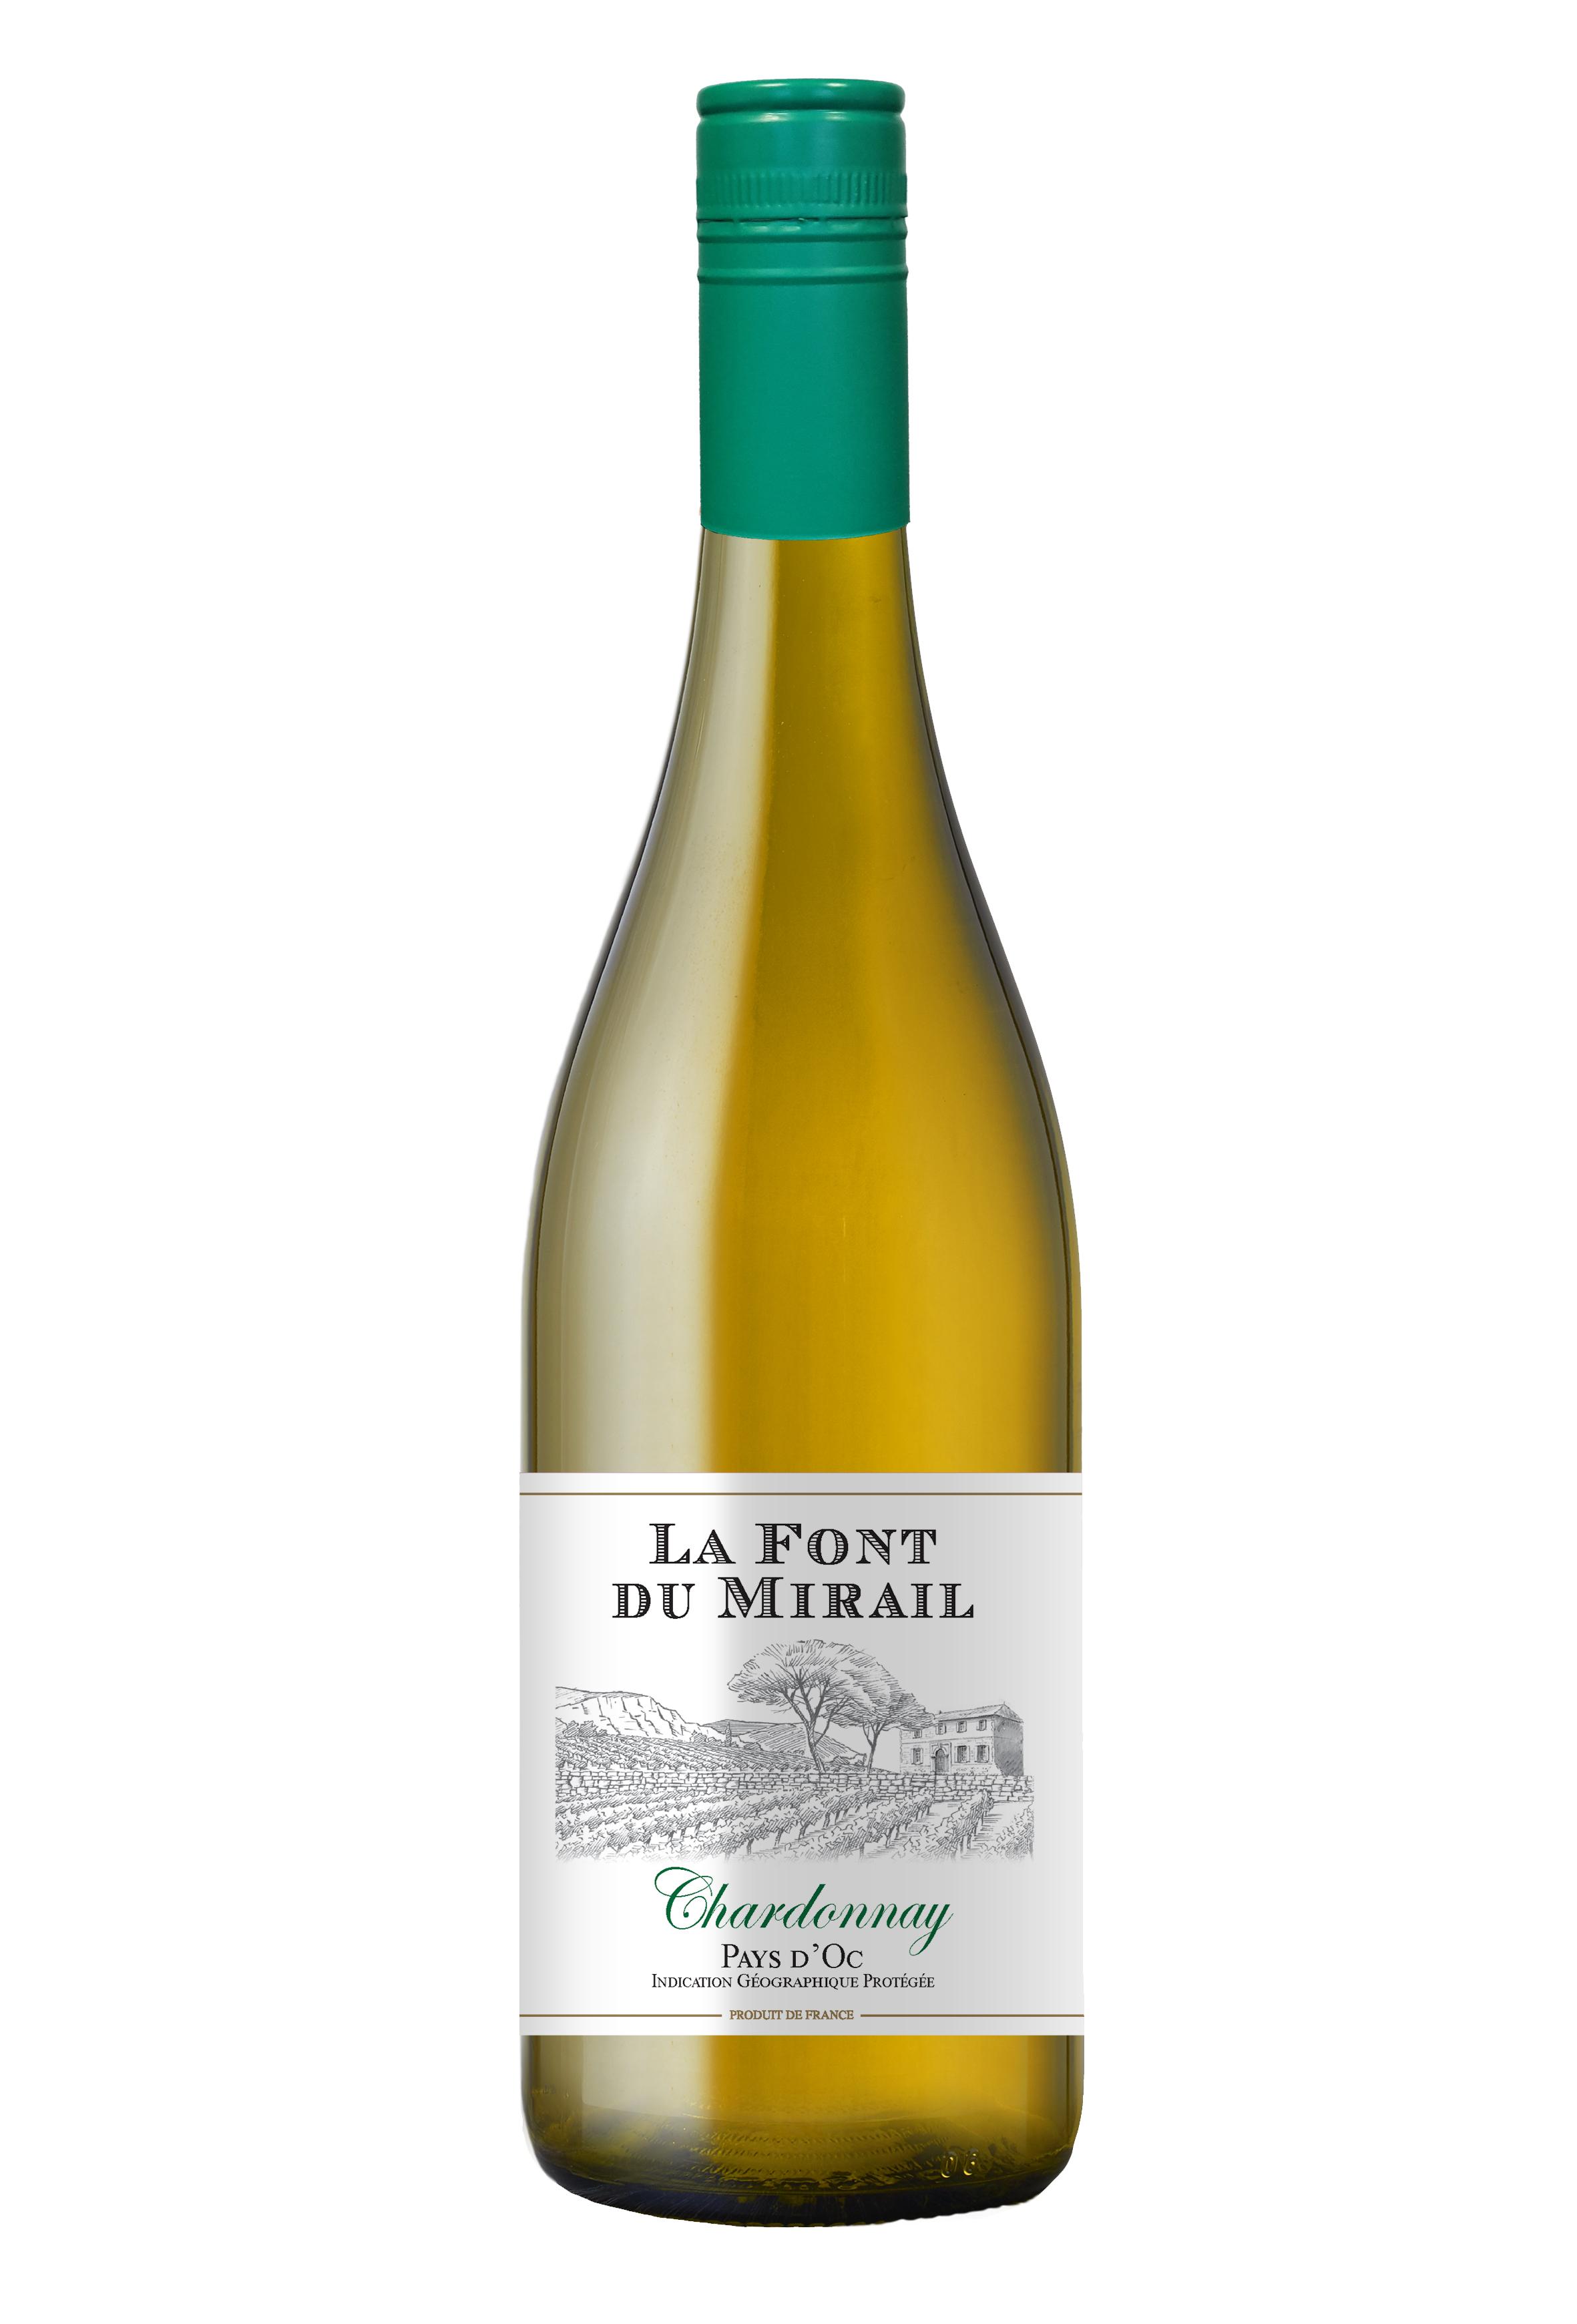 La Font du Mirail Chardonnay 2019